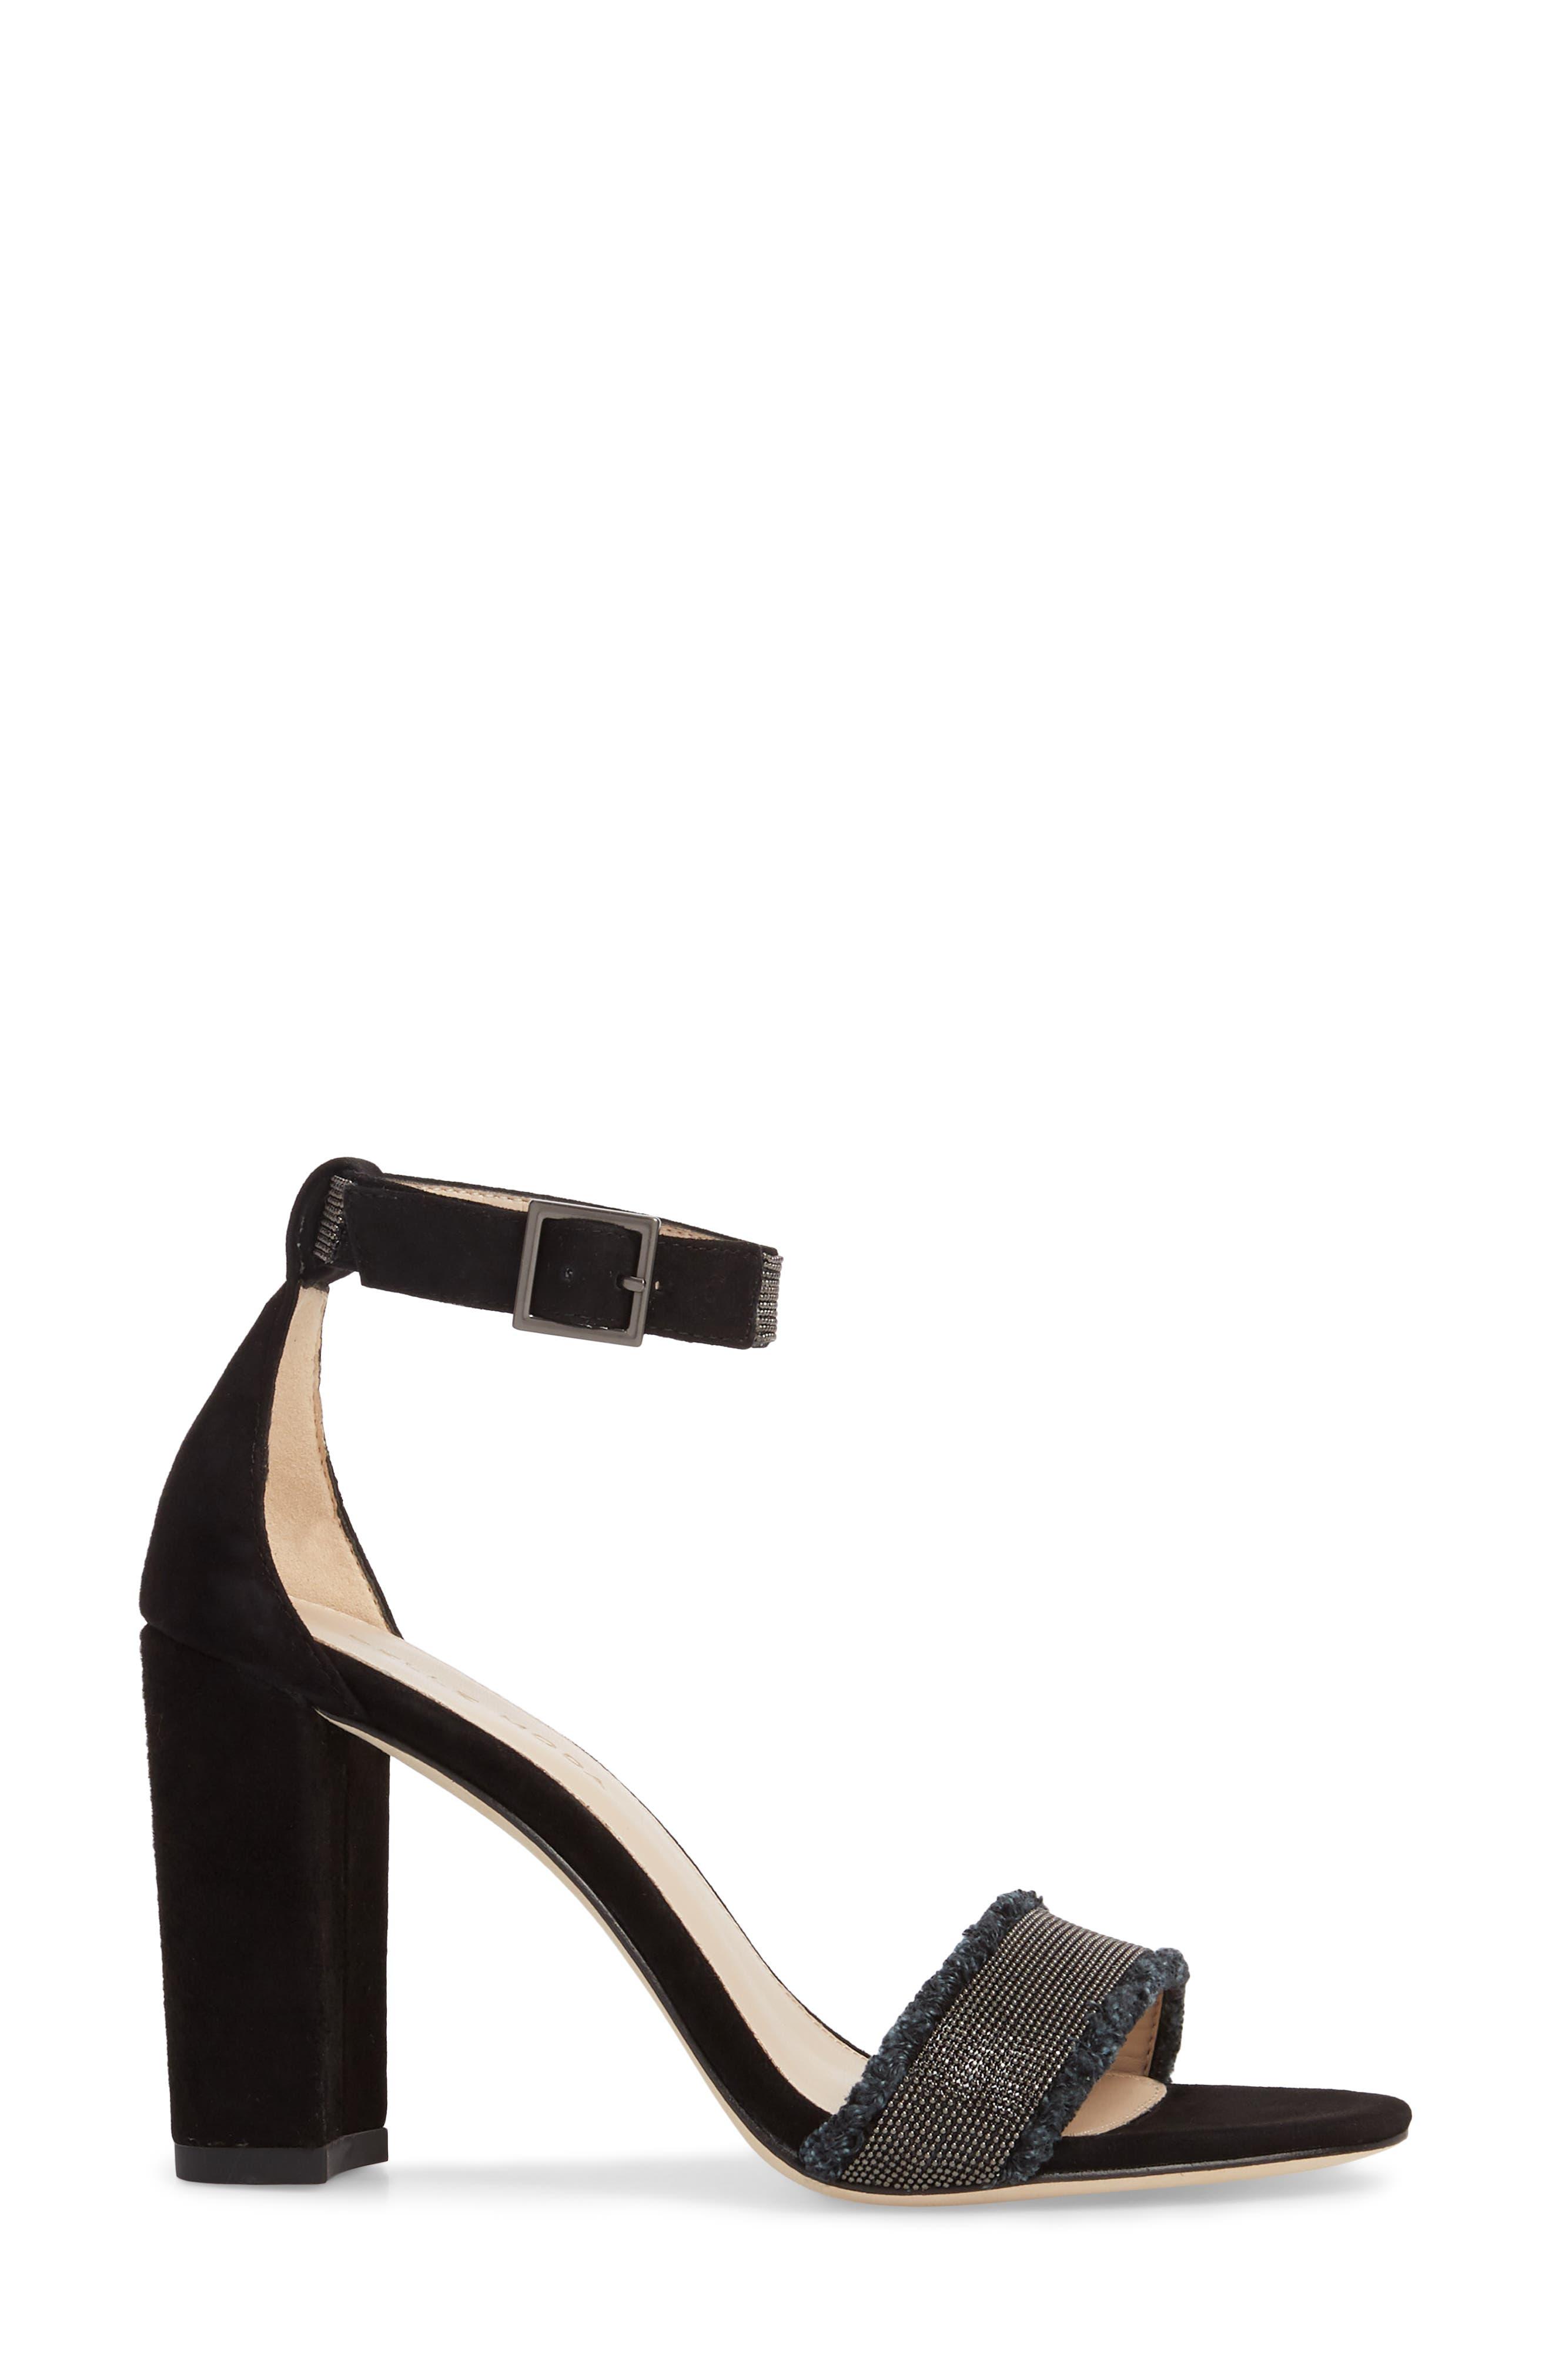 PELLE MODA,                             Bonnie6 Embellished Sandal,                             Alternate thumbnail 3, color,                             BLACK SUEDE